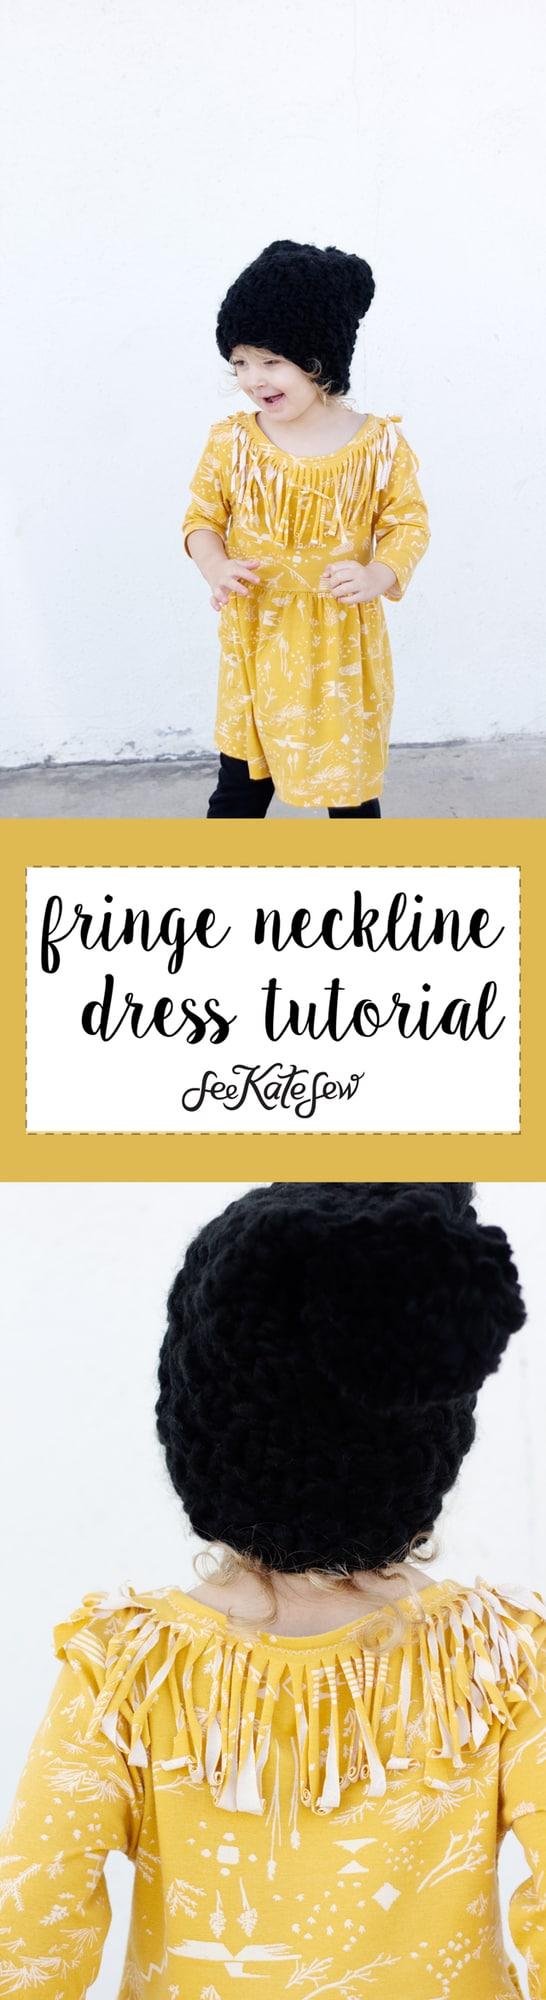 RINGE neckline tutorial| See Kate Sew